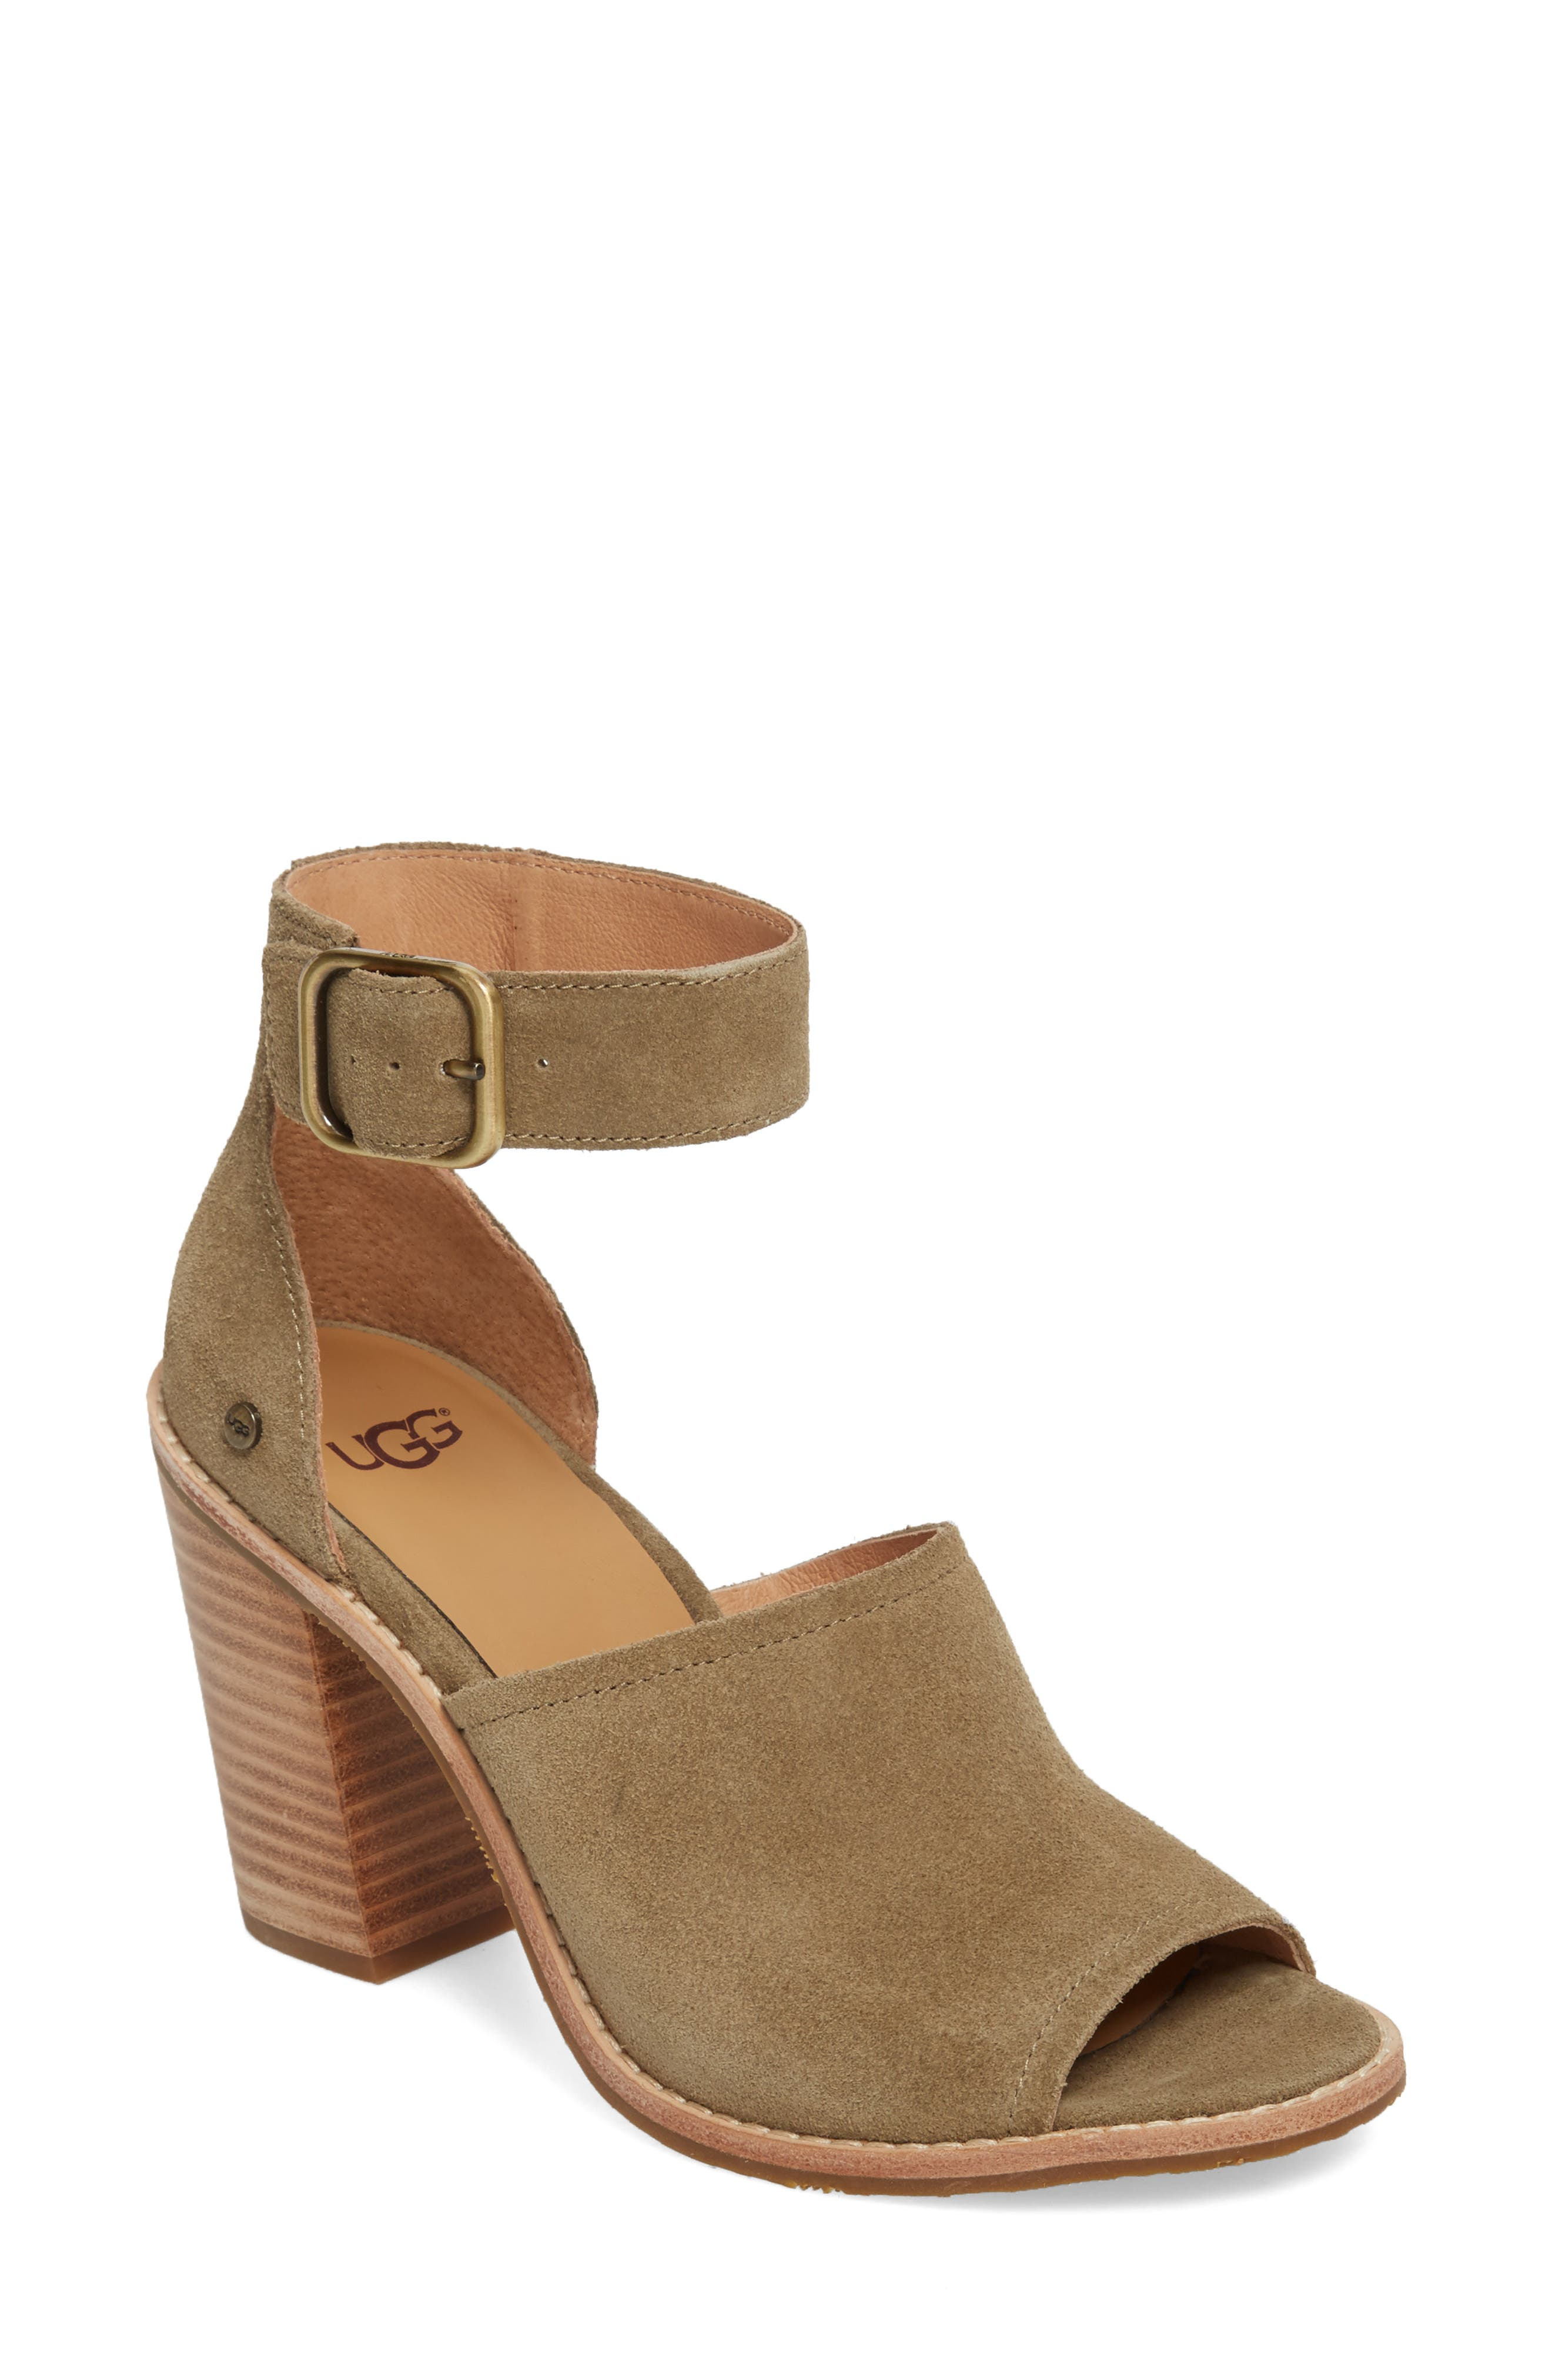 Aja Ankle Strap Sandal by Ugg®